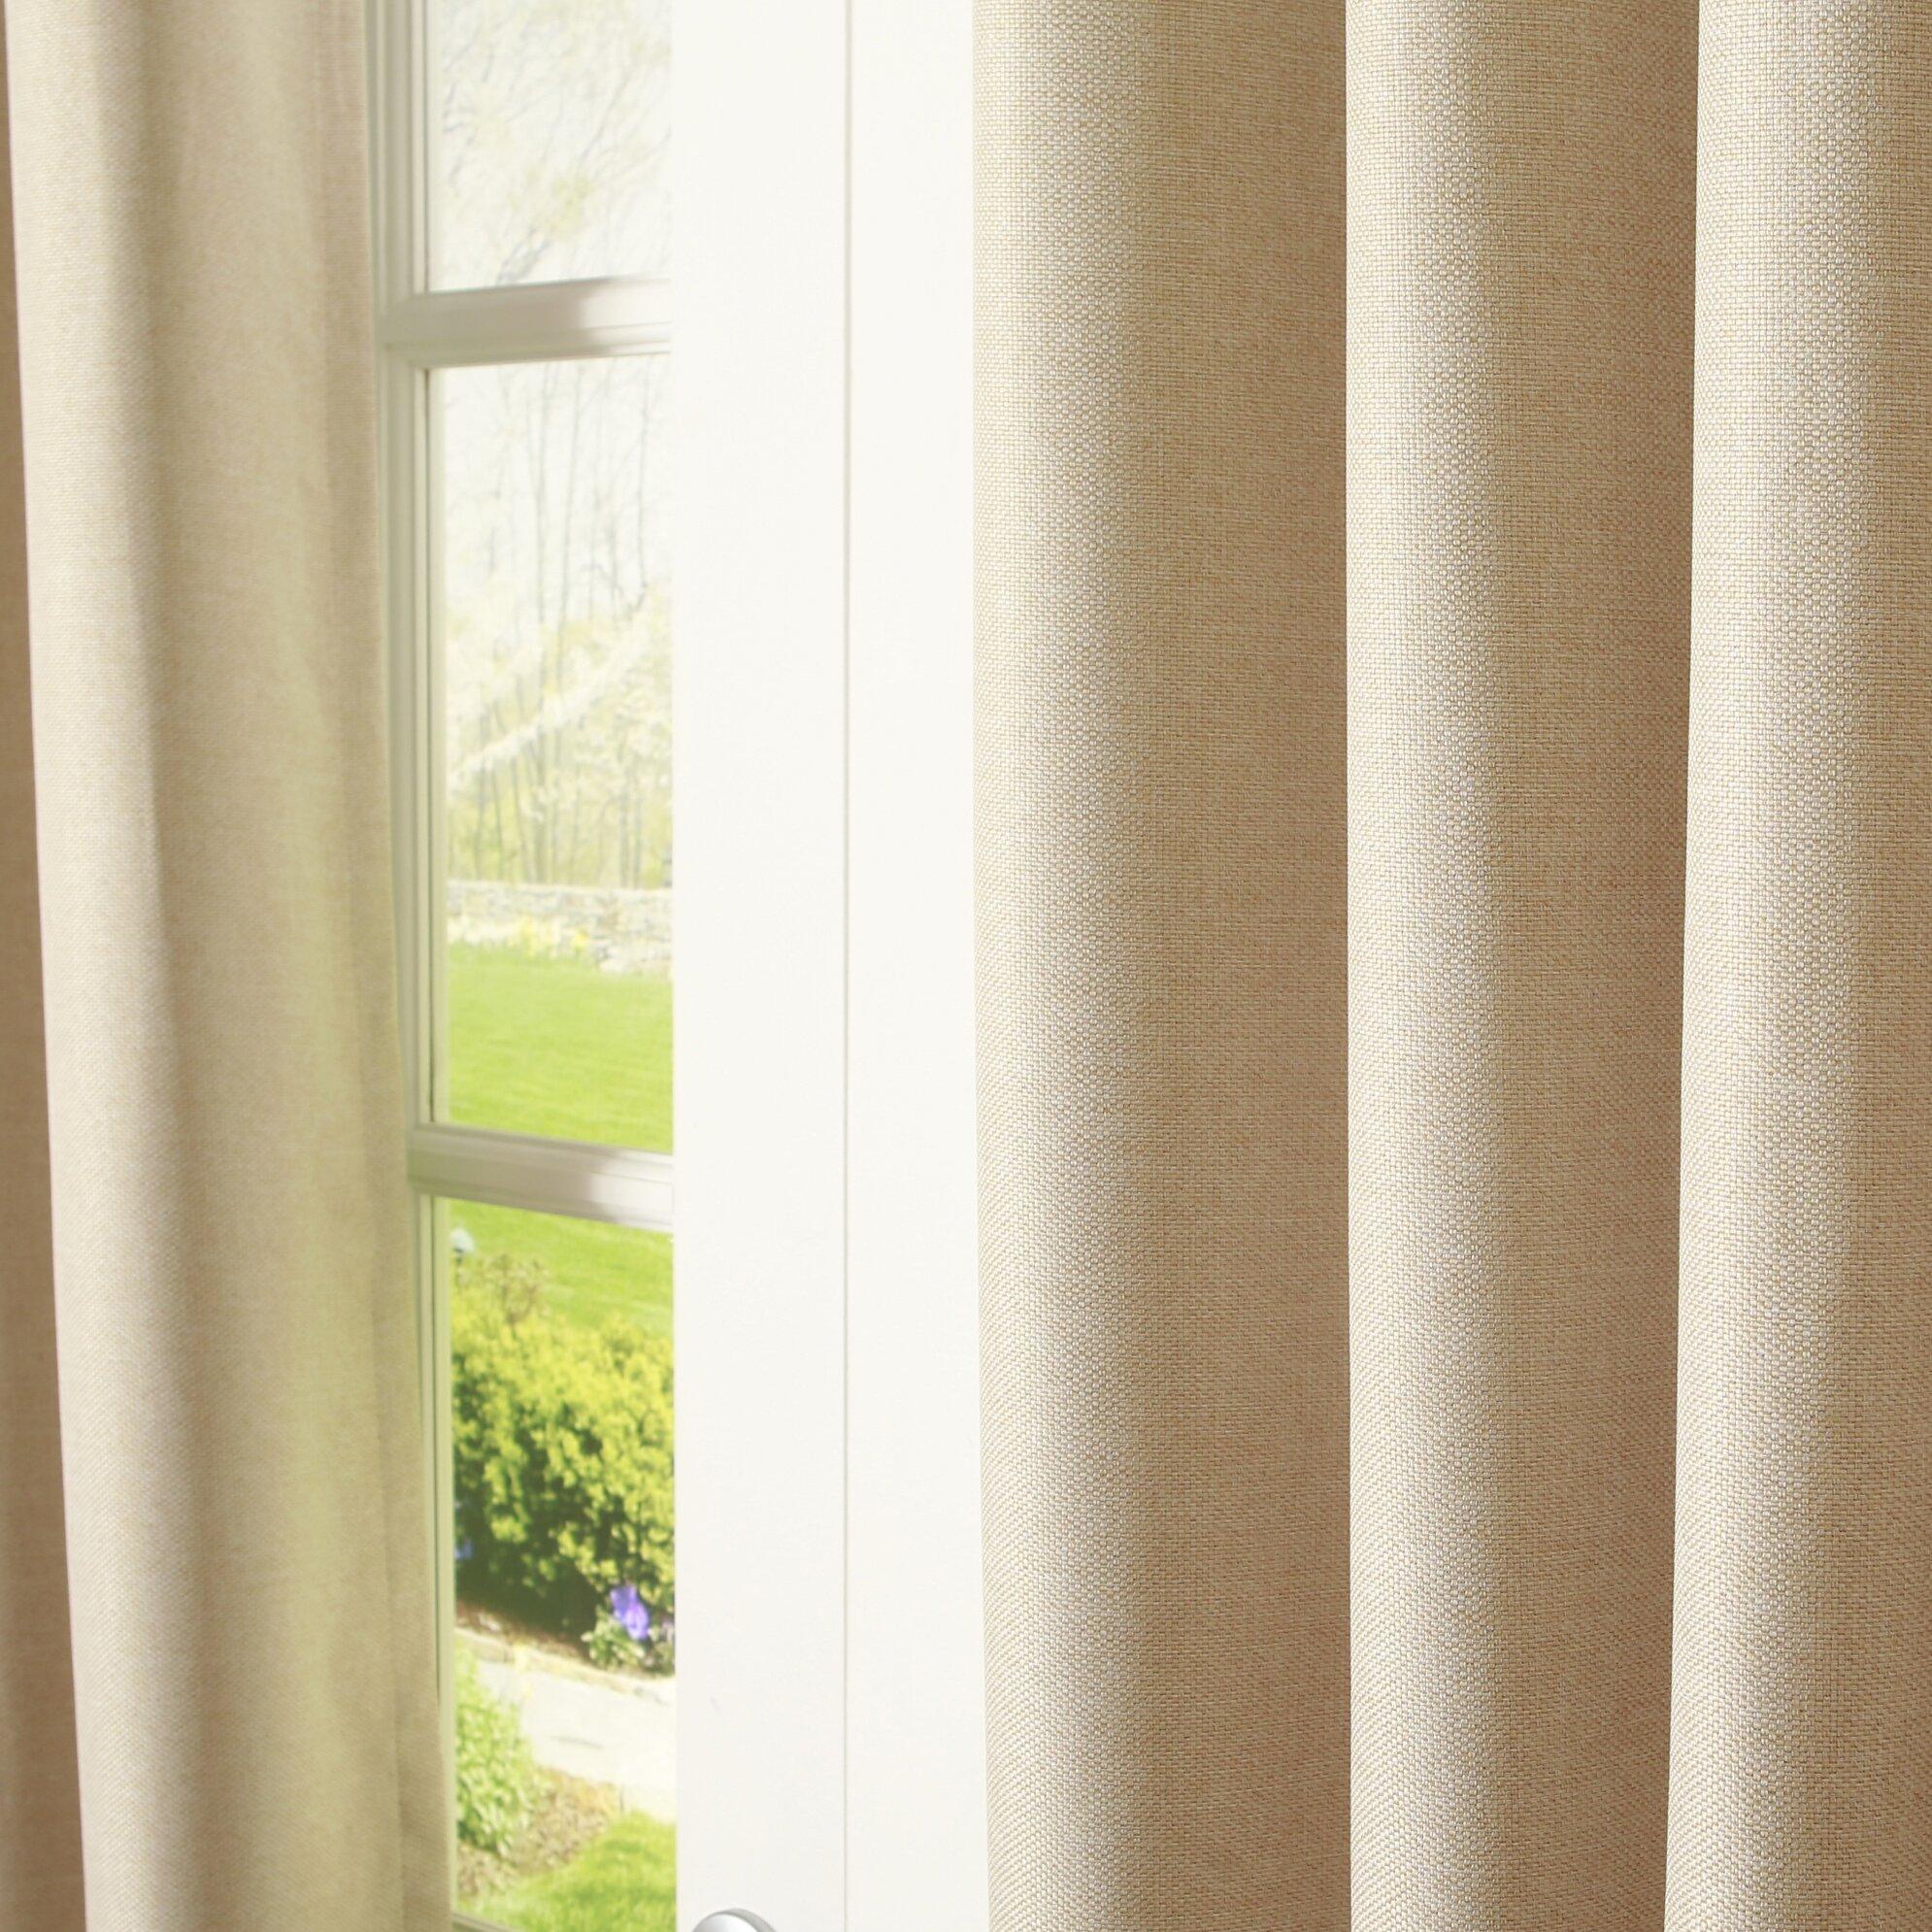 Best Home Fashion Inc Basketweave Room Darkening Blackout Curtain Panels Reviews Wayfair